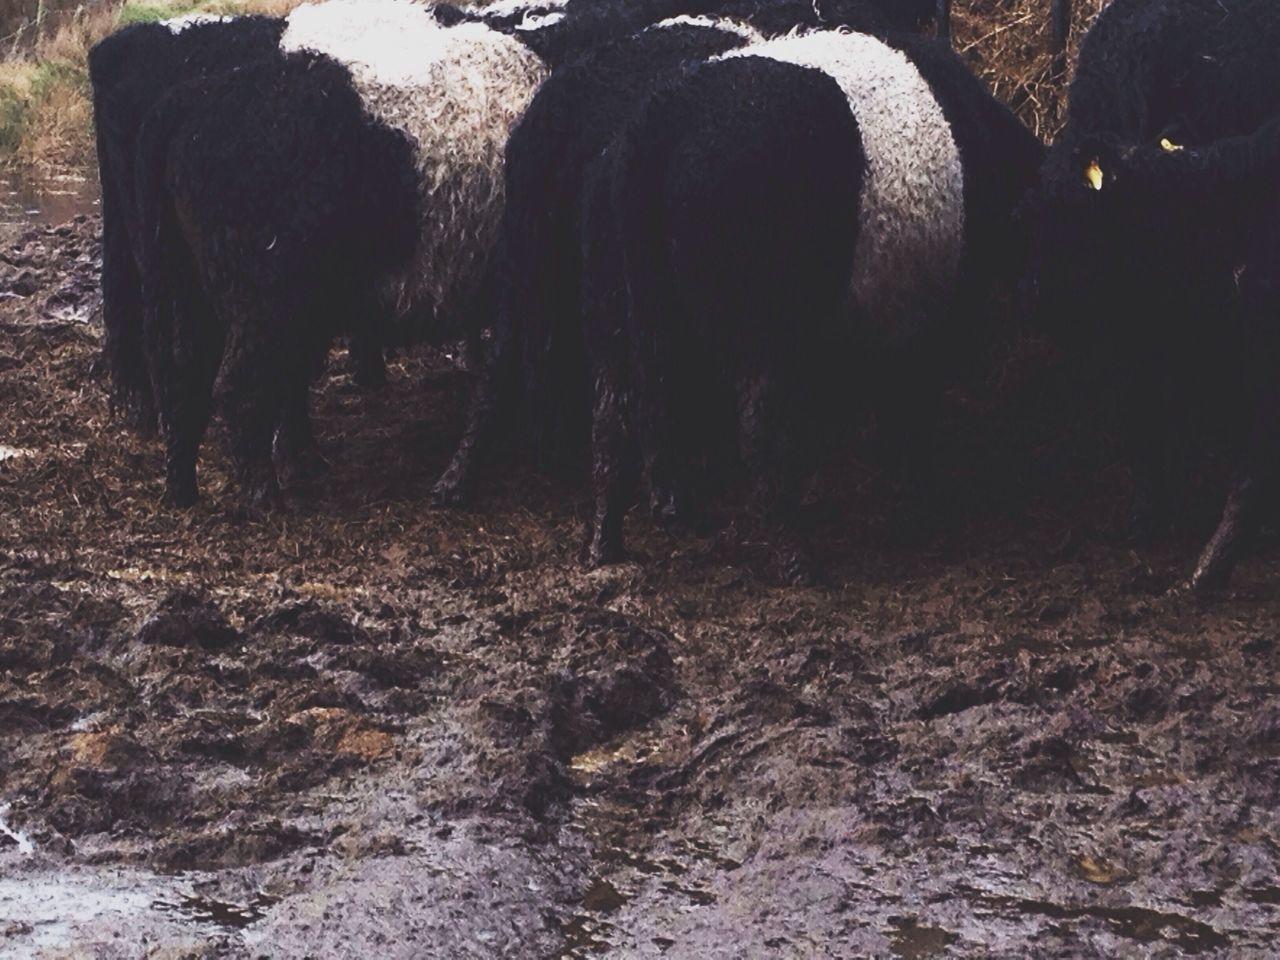 Rear view of sheep grazing